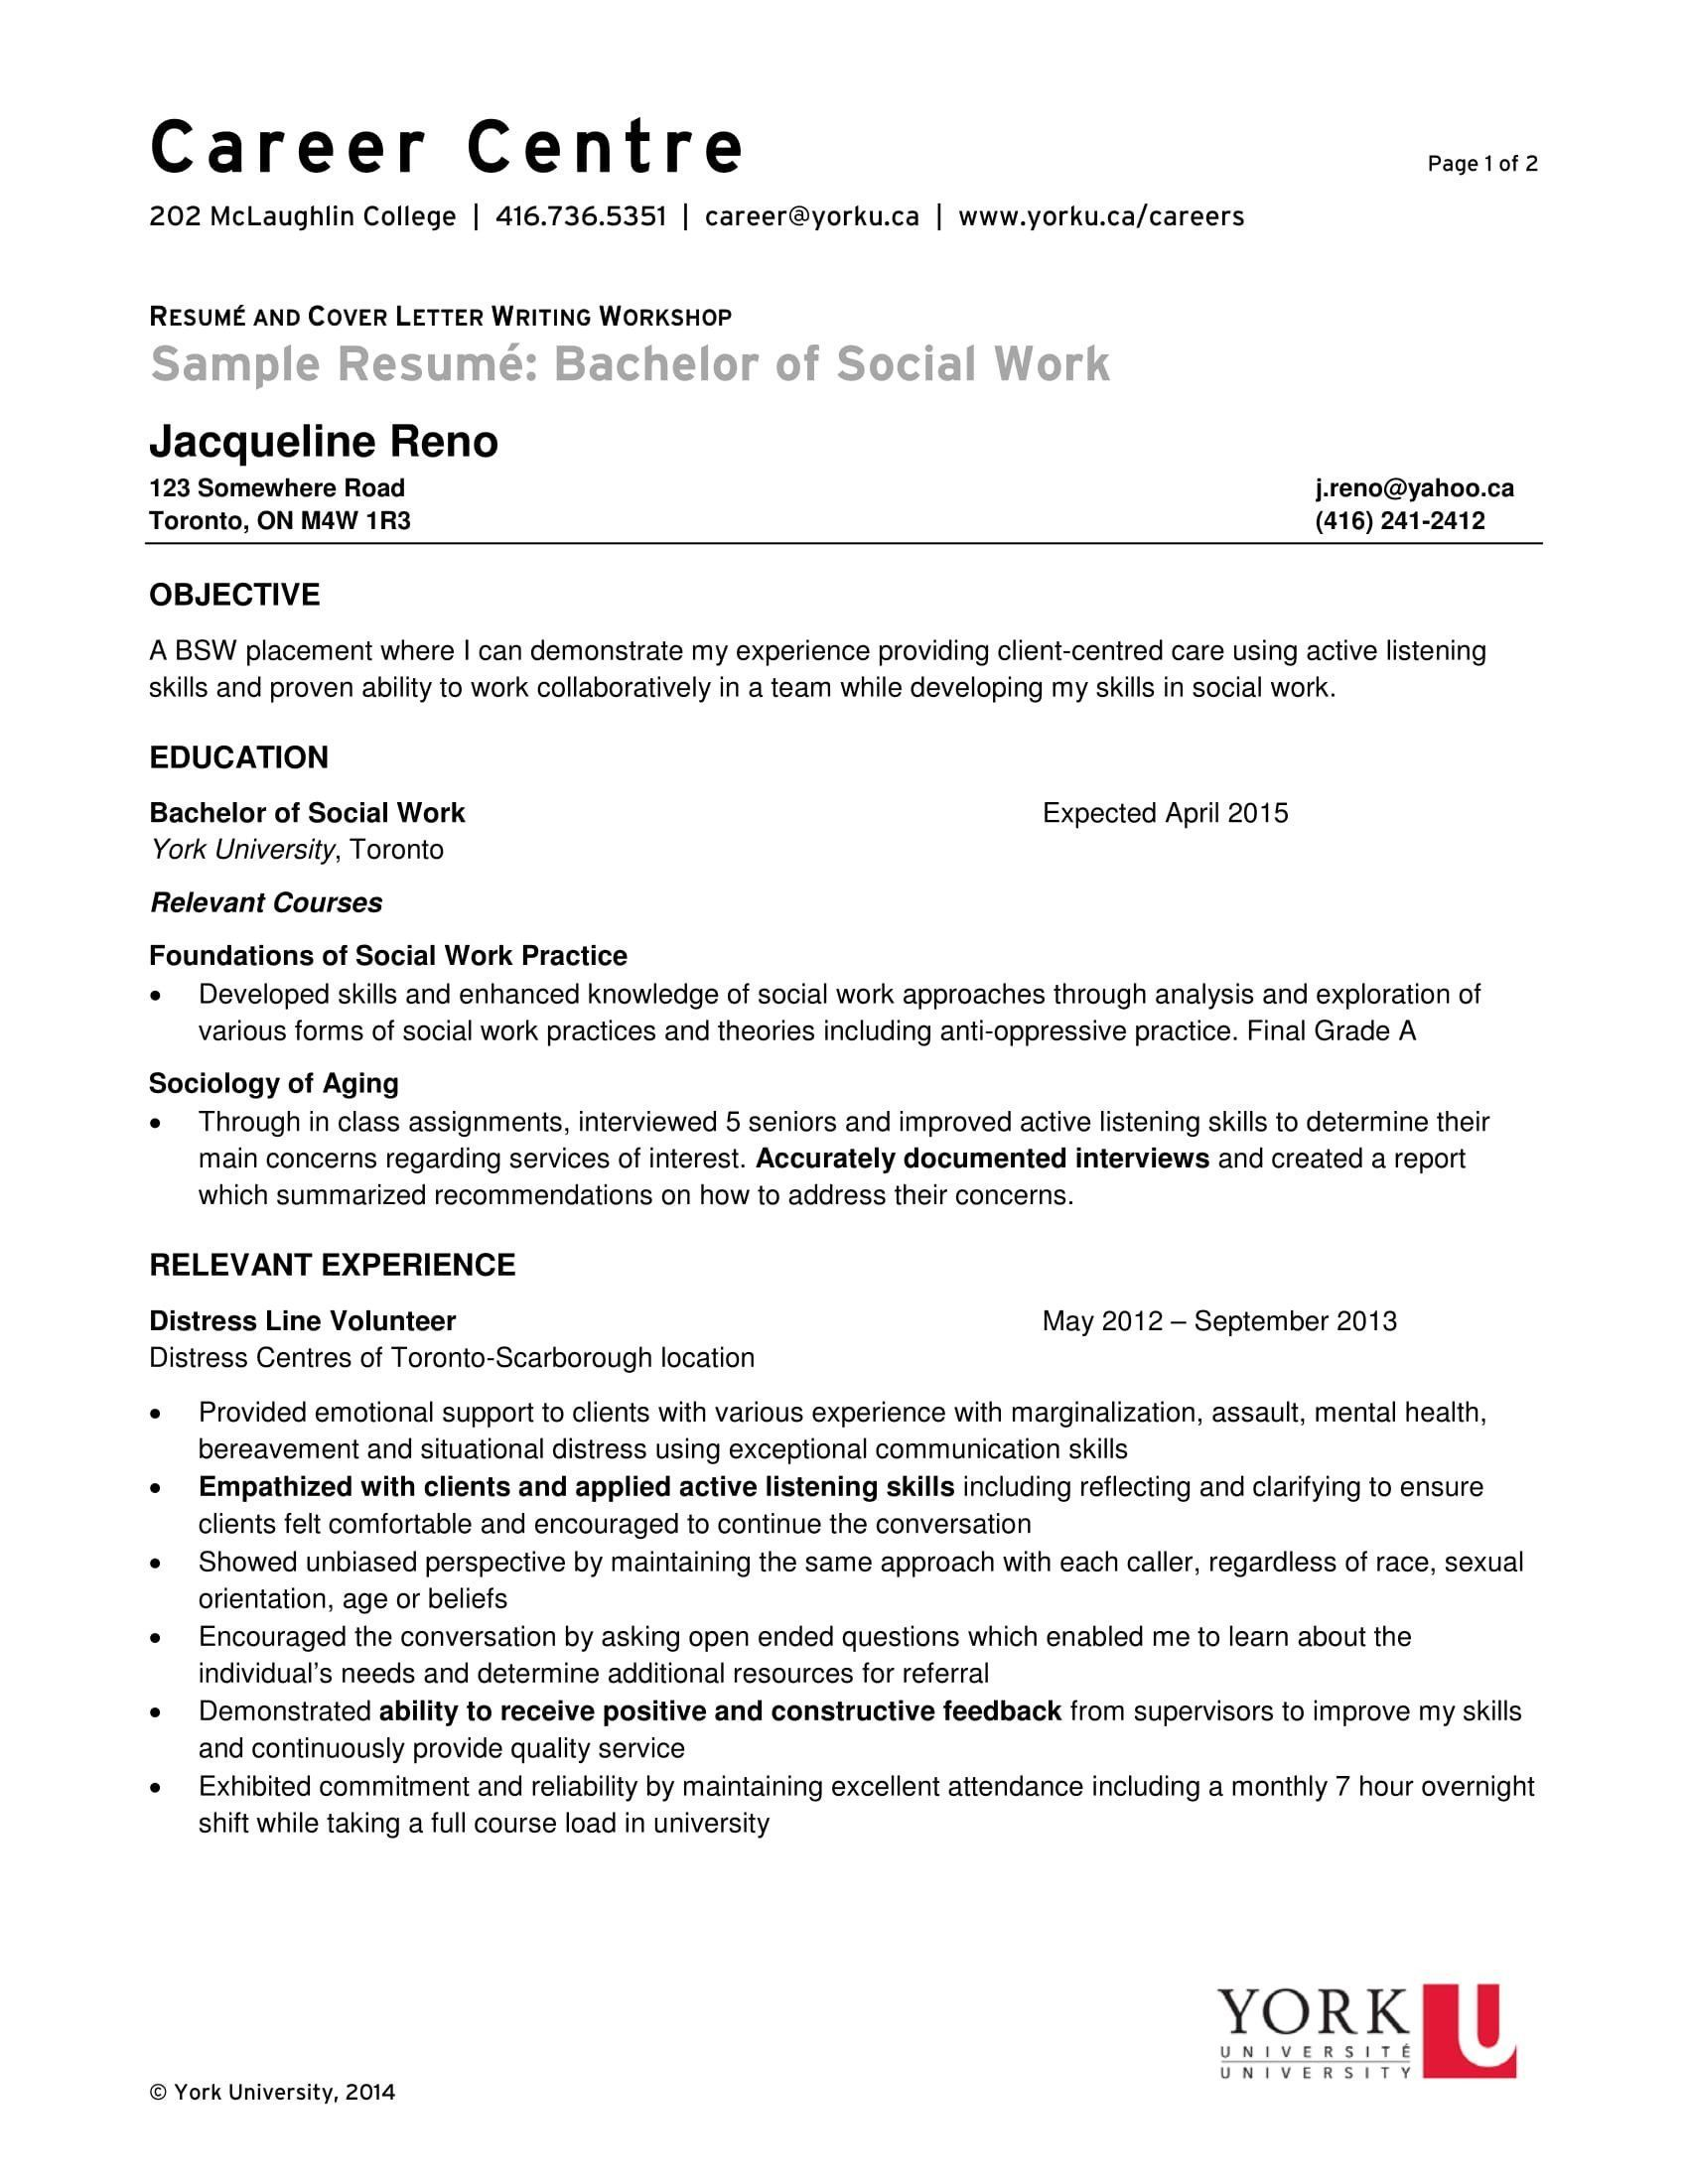 Resume for social work very good 14 best social worker